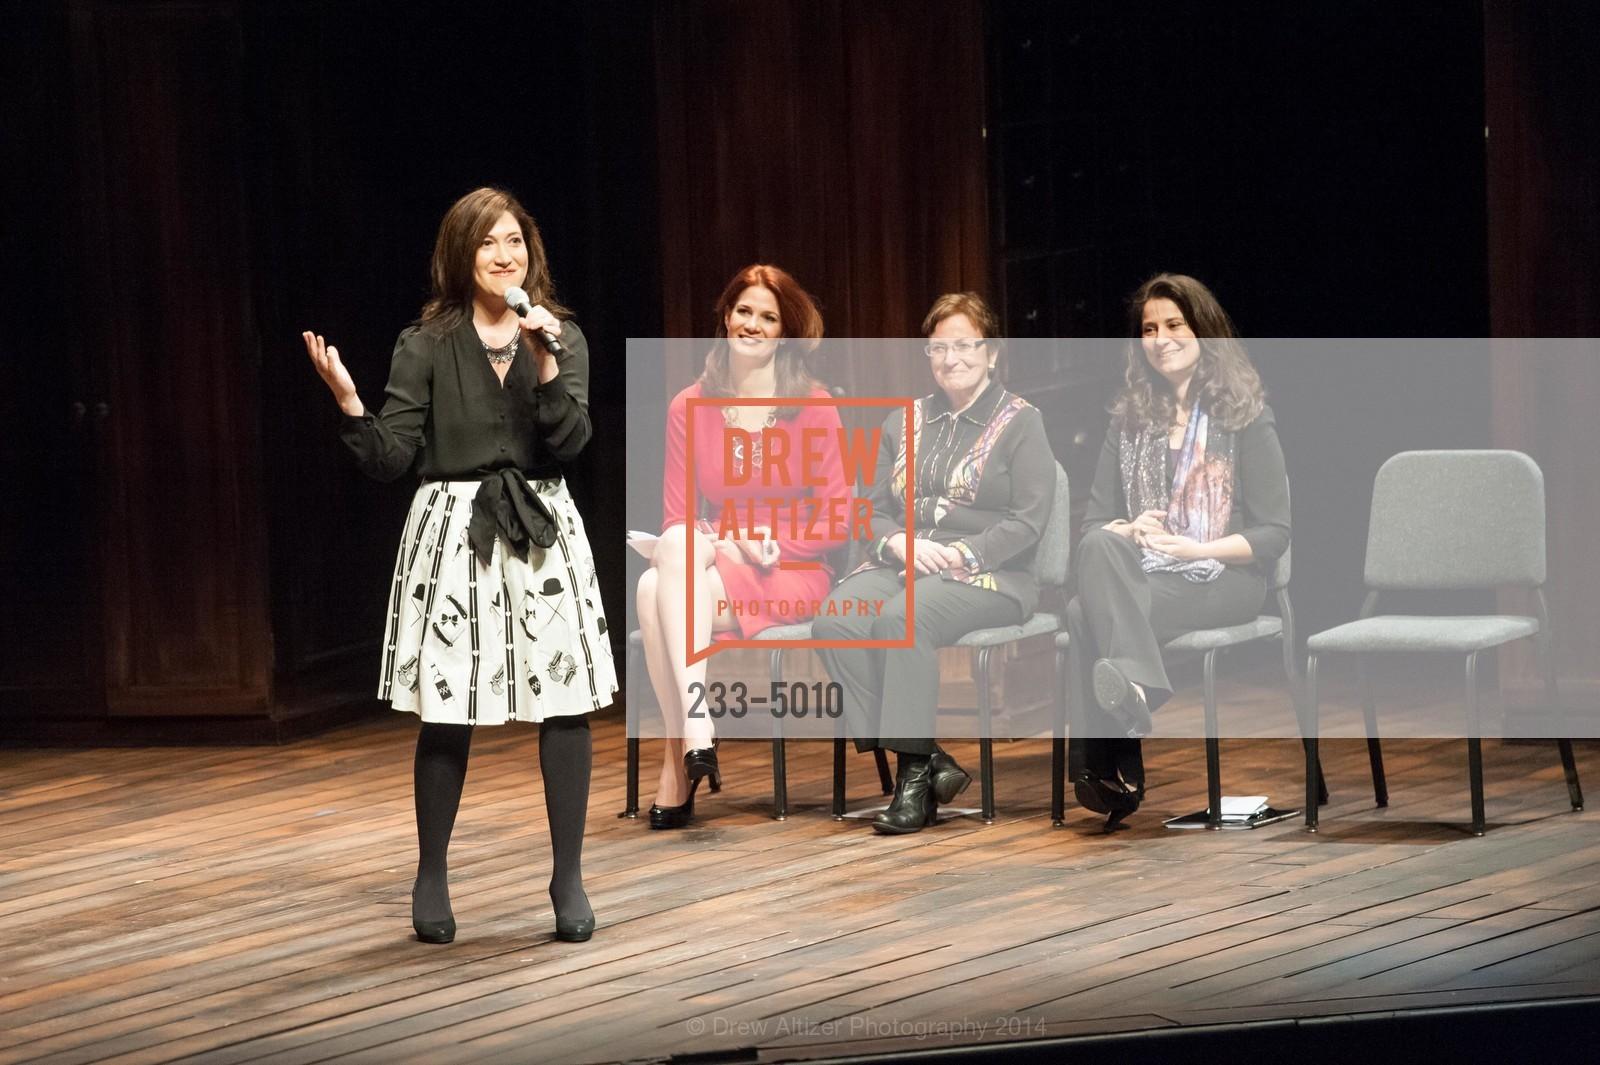 Randi Zuckerberg, Jenny Dearborn, Ann Bowers, Natalie Batalha, Photo #233-5010